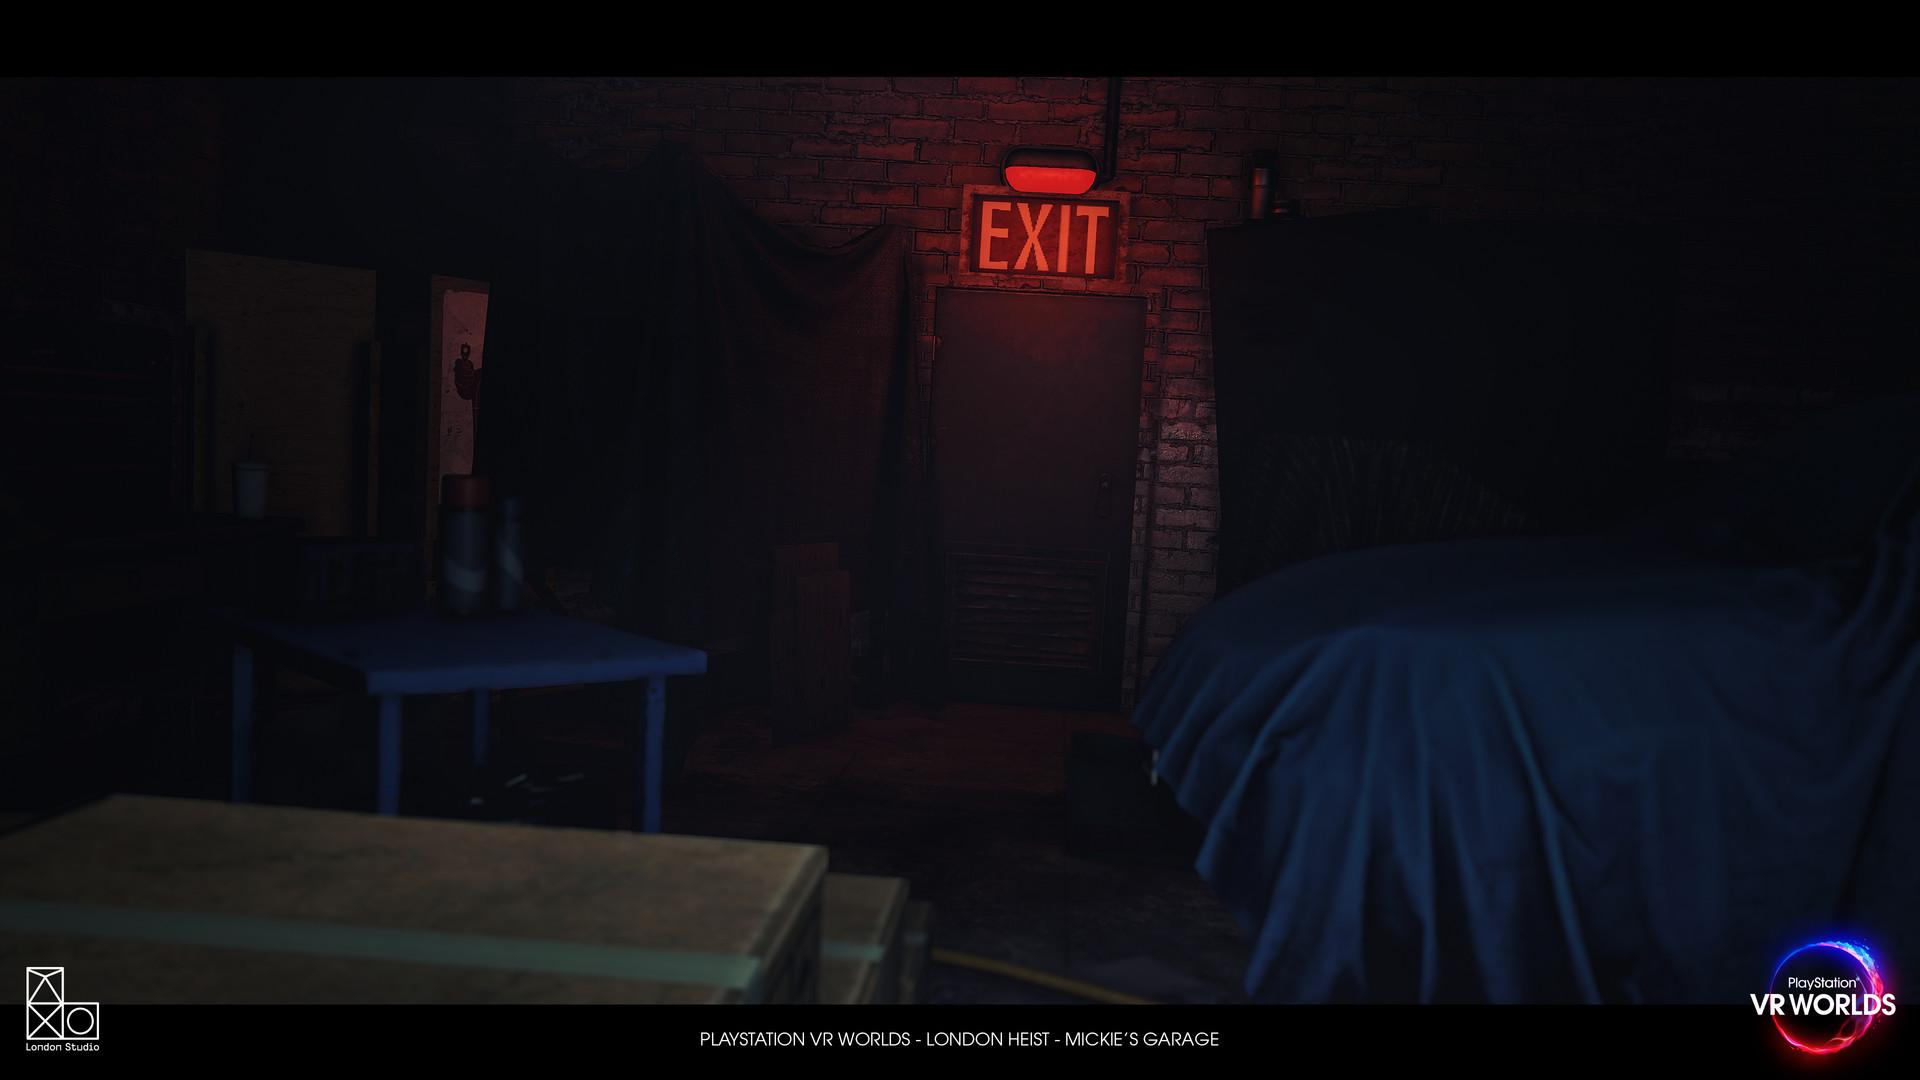 21bb54a87e1c ArtStation - PlayStation VR Worlds - Compilation